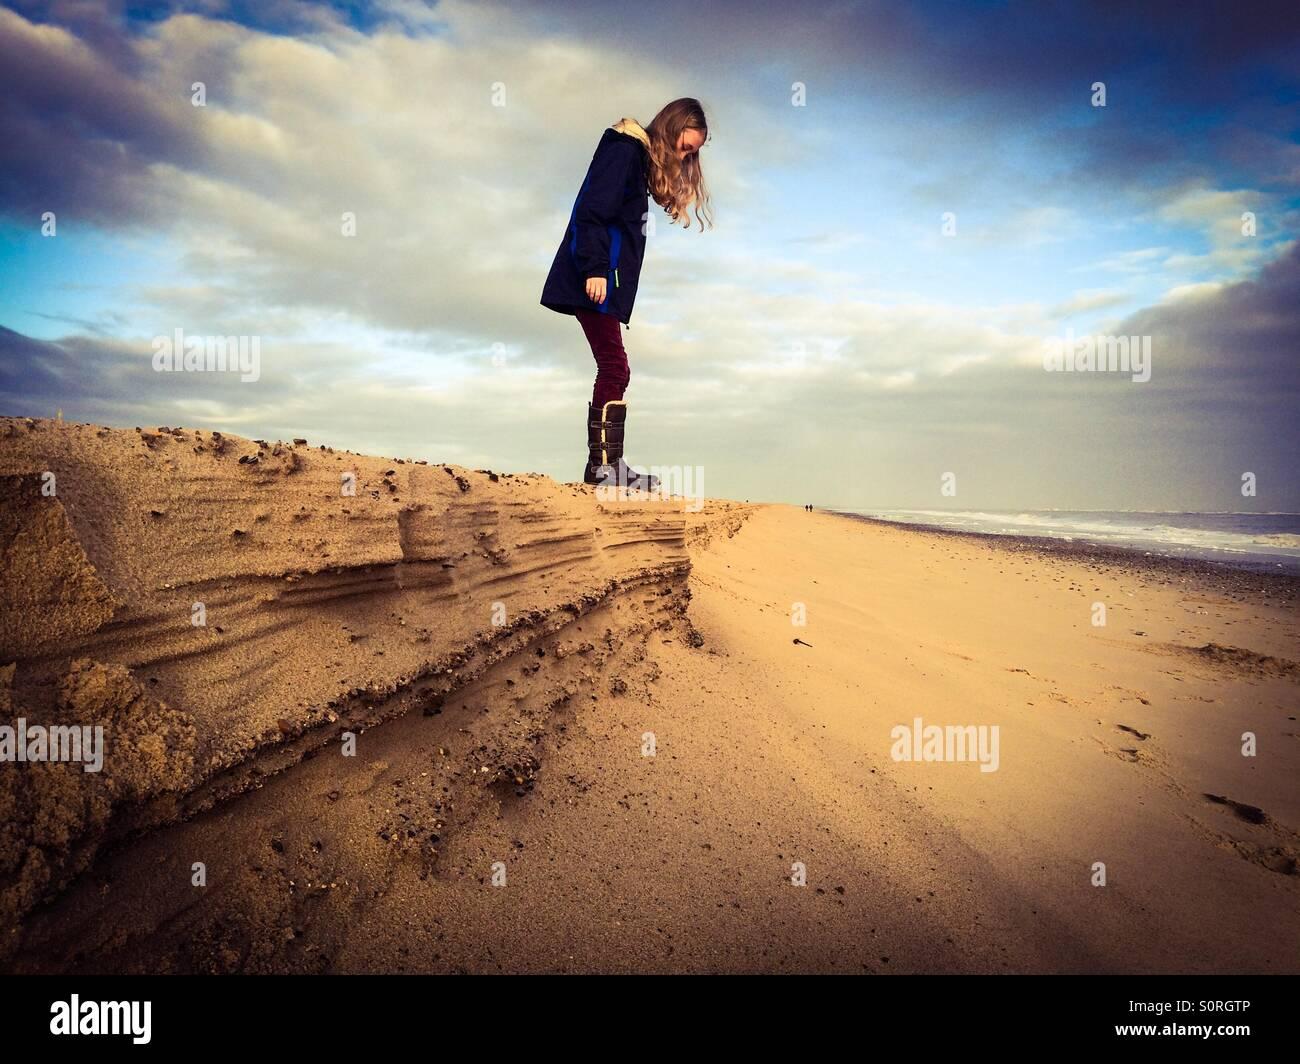 11 year old girl at Winterton beach in Norfolk, UK - Stock Image